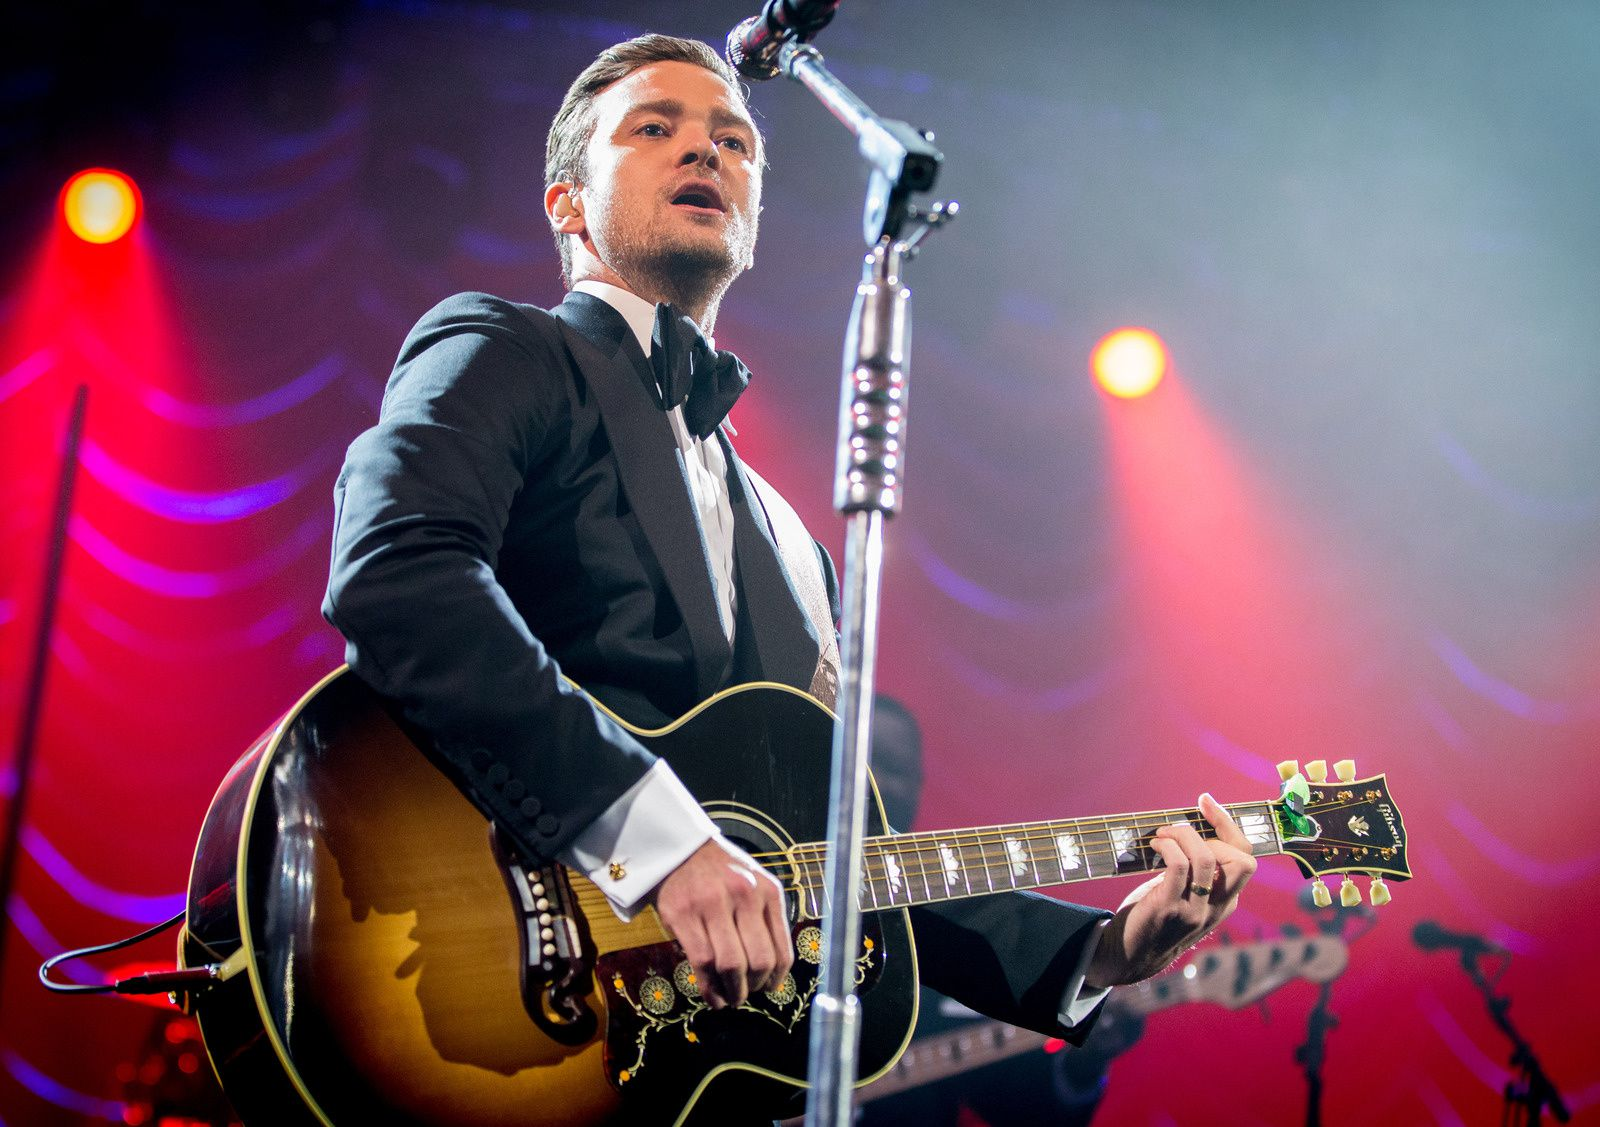 Gagnez une guitare dédicacée de Justin Timberlake!